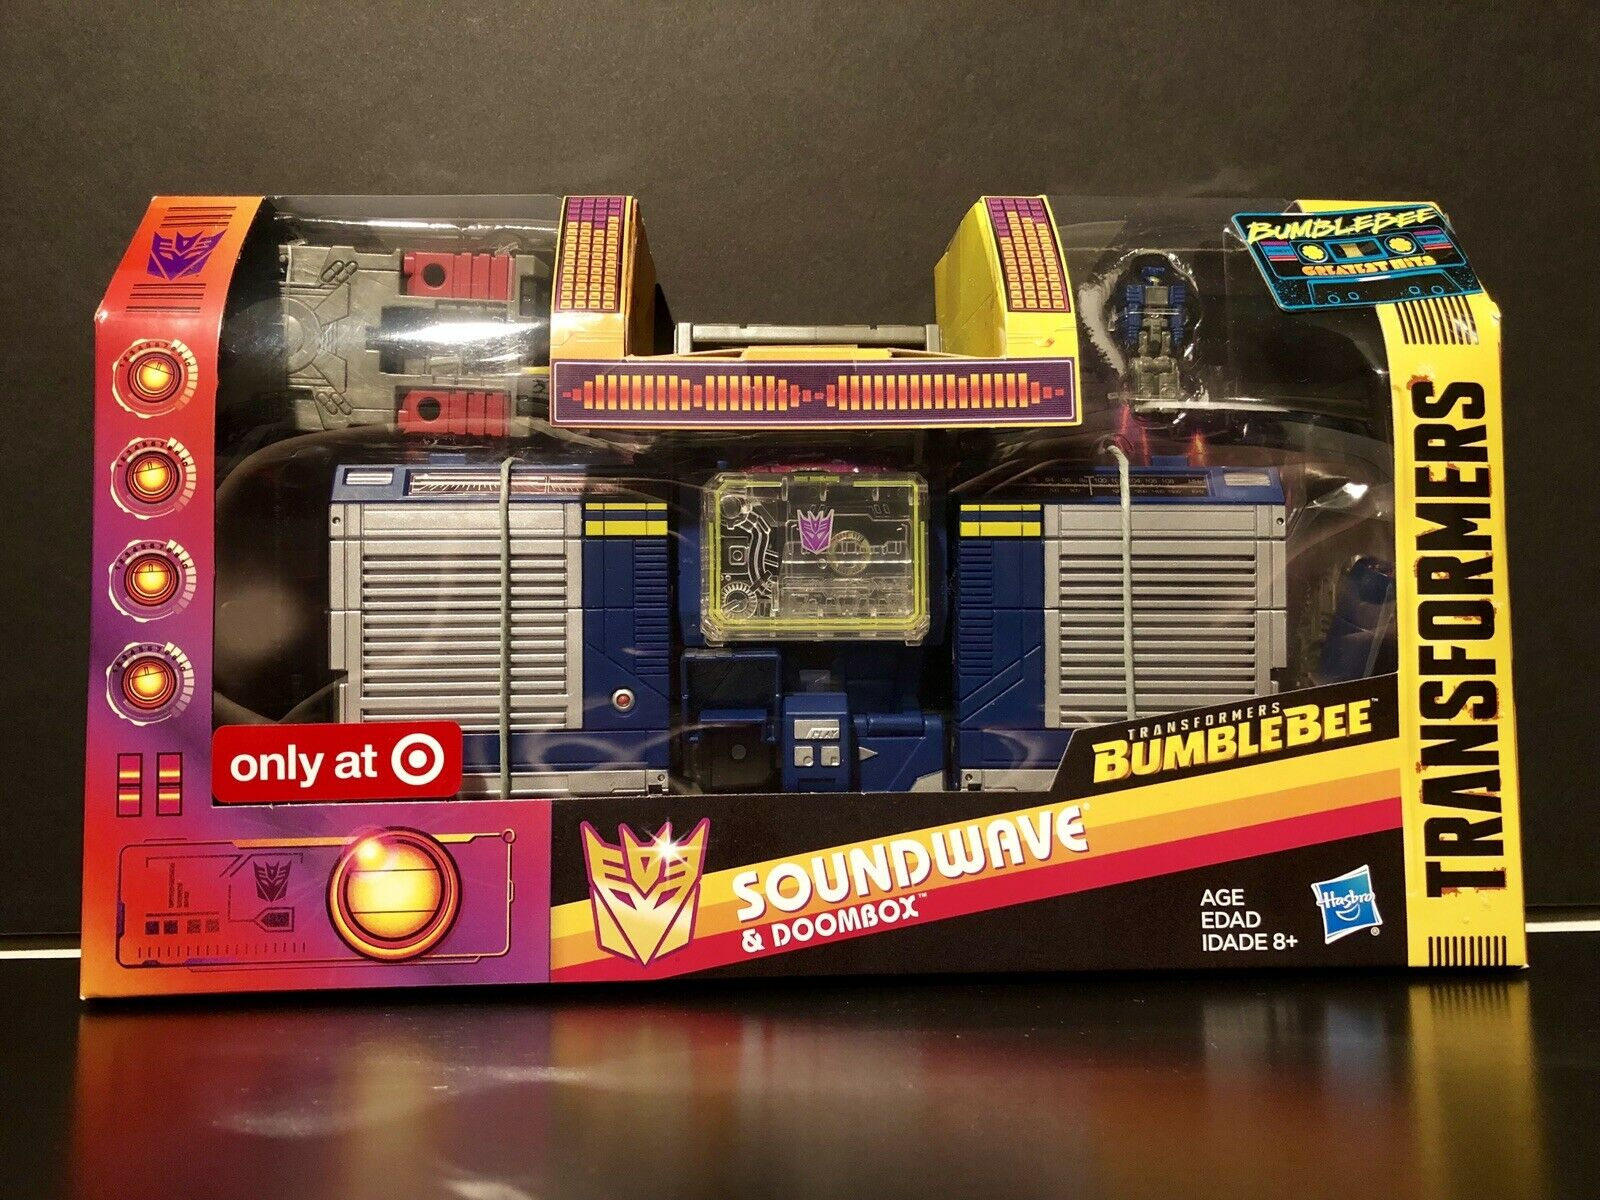 HasbroTransformers Bumblebee Greatest Hits SOUNDWAVE & DOOMBOX Target Exclusive